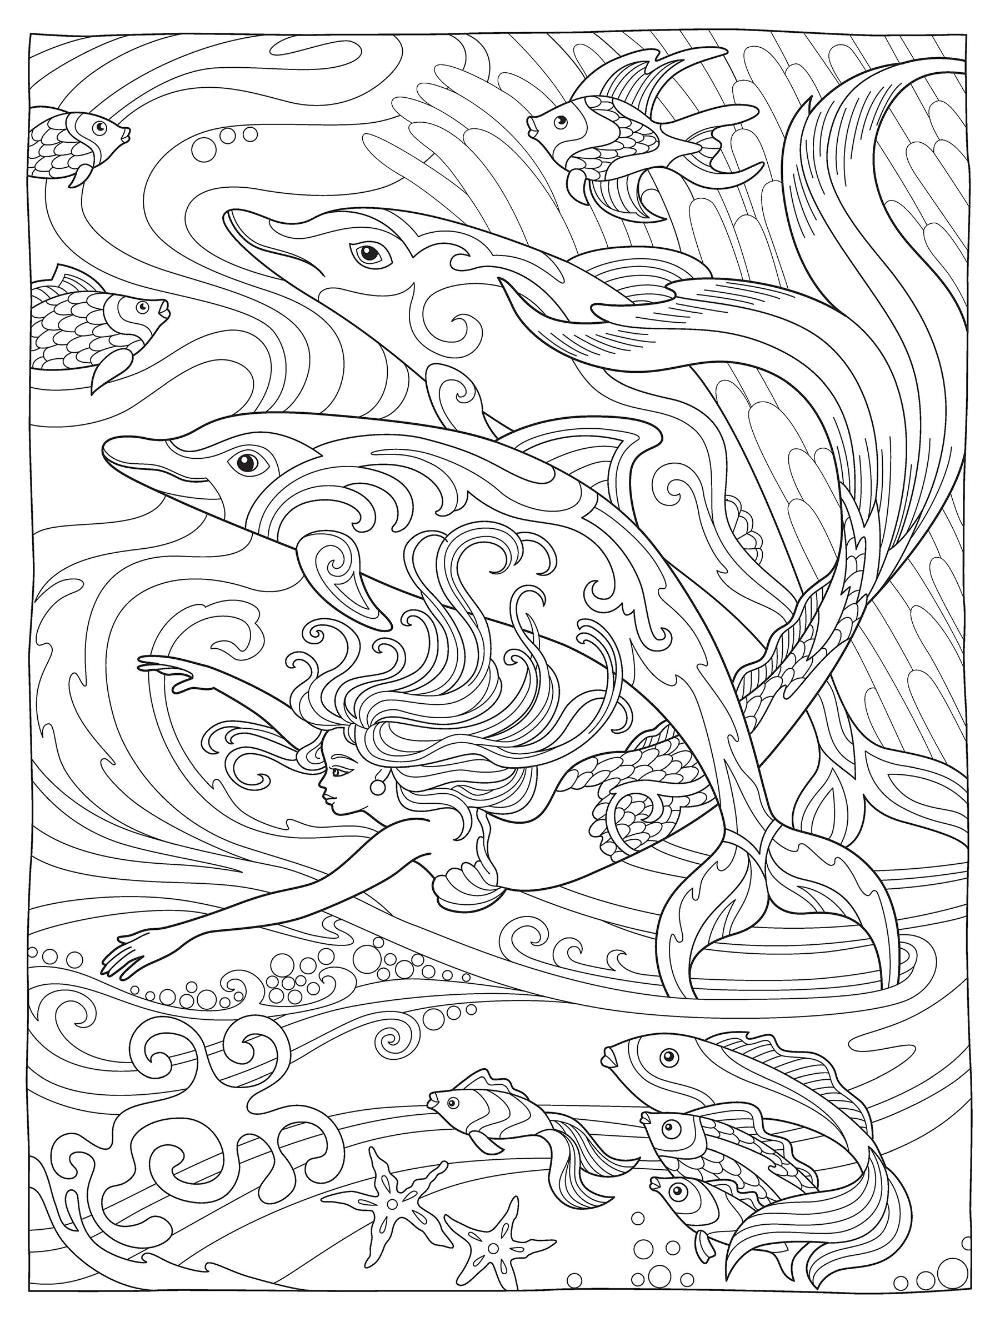 Amazon Com Creative Haven Magnificent Mermaids Coloring Book Creative Haven Coloring Books 0800 Mermaid Coloring Book Mermaid Coloring Pages Coloring Pages [ 1327 x 1000 Pixel ]